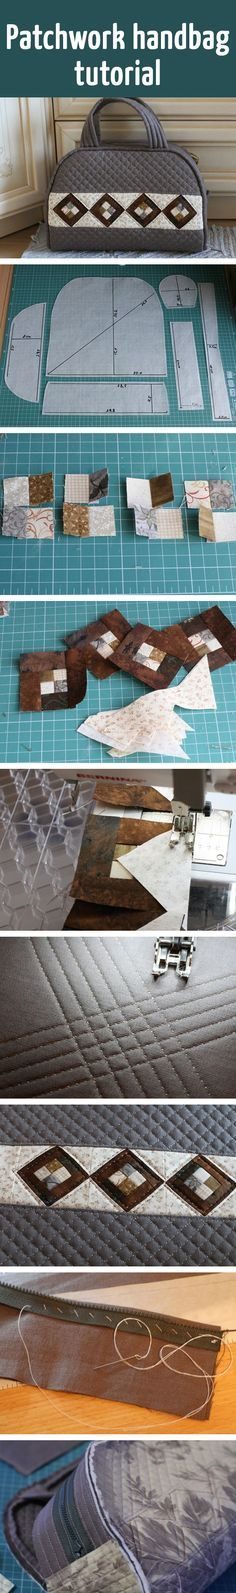 Çanta yapımı Patchwork handbag tutorial